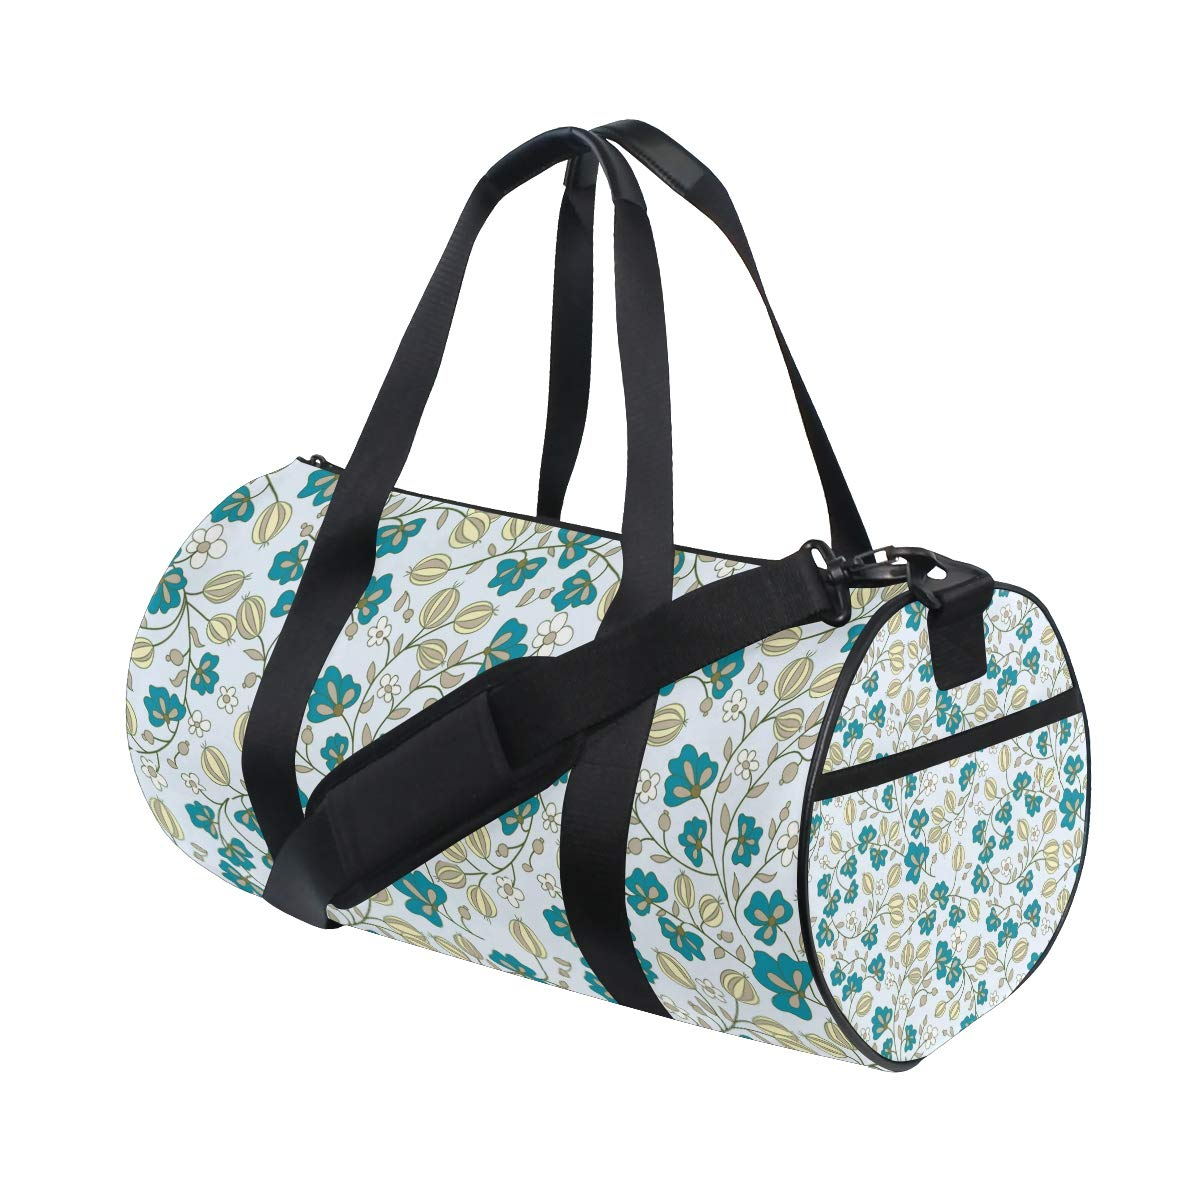 Waterproof Non-Slip Wearable Crossbody Bag fitness bag Shoulder Bag Fruit Loops Cereal Picture